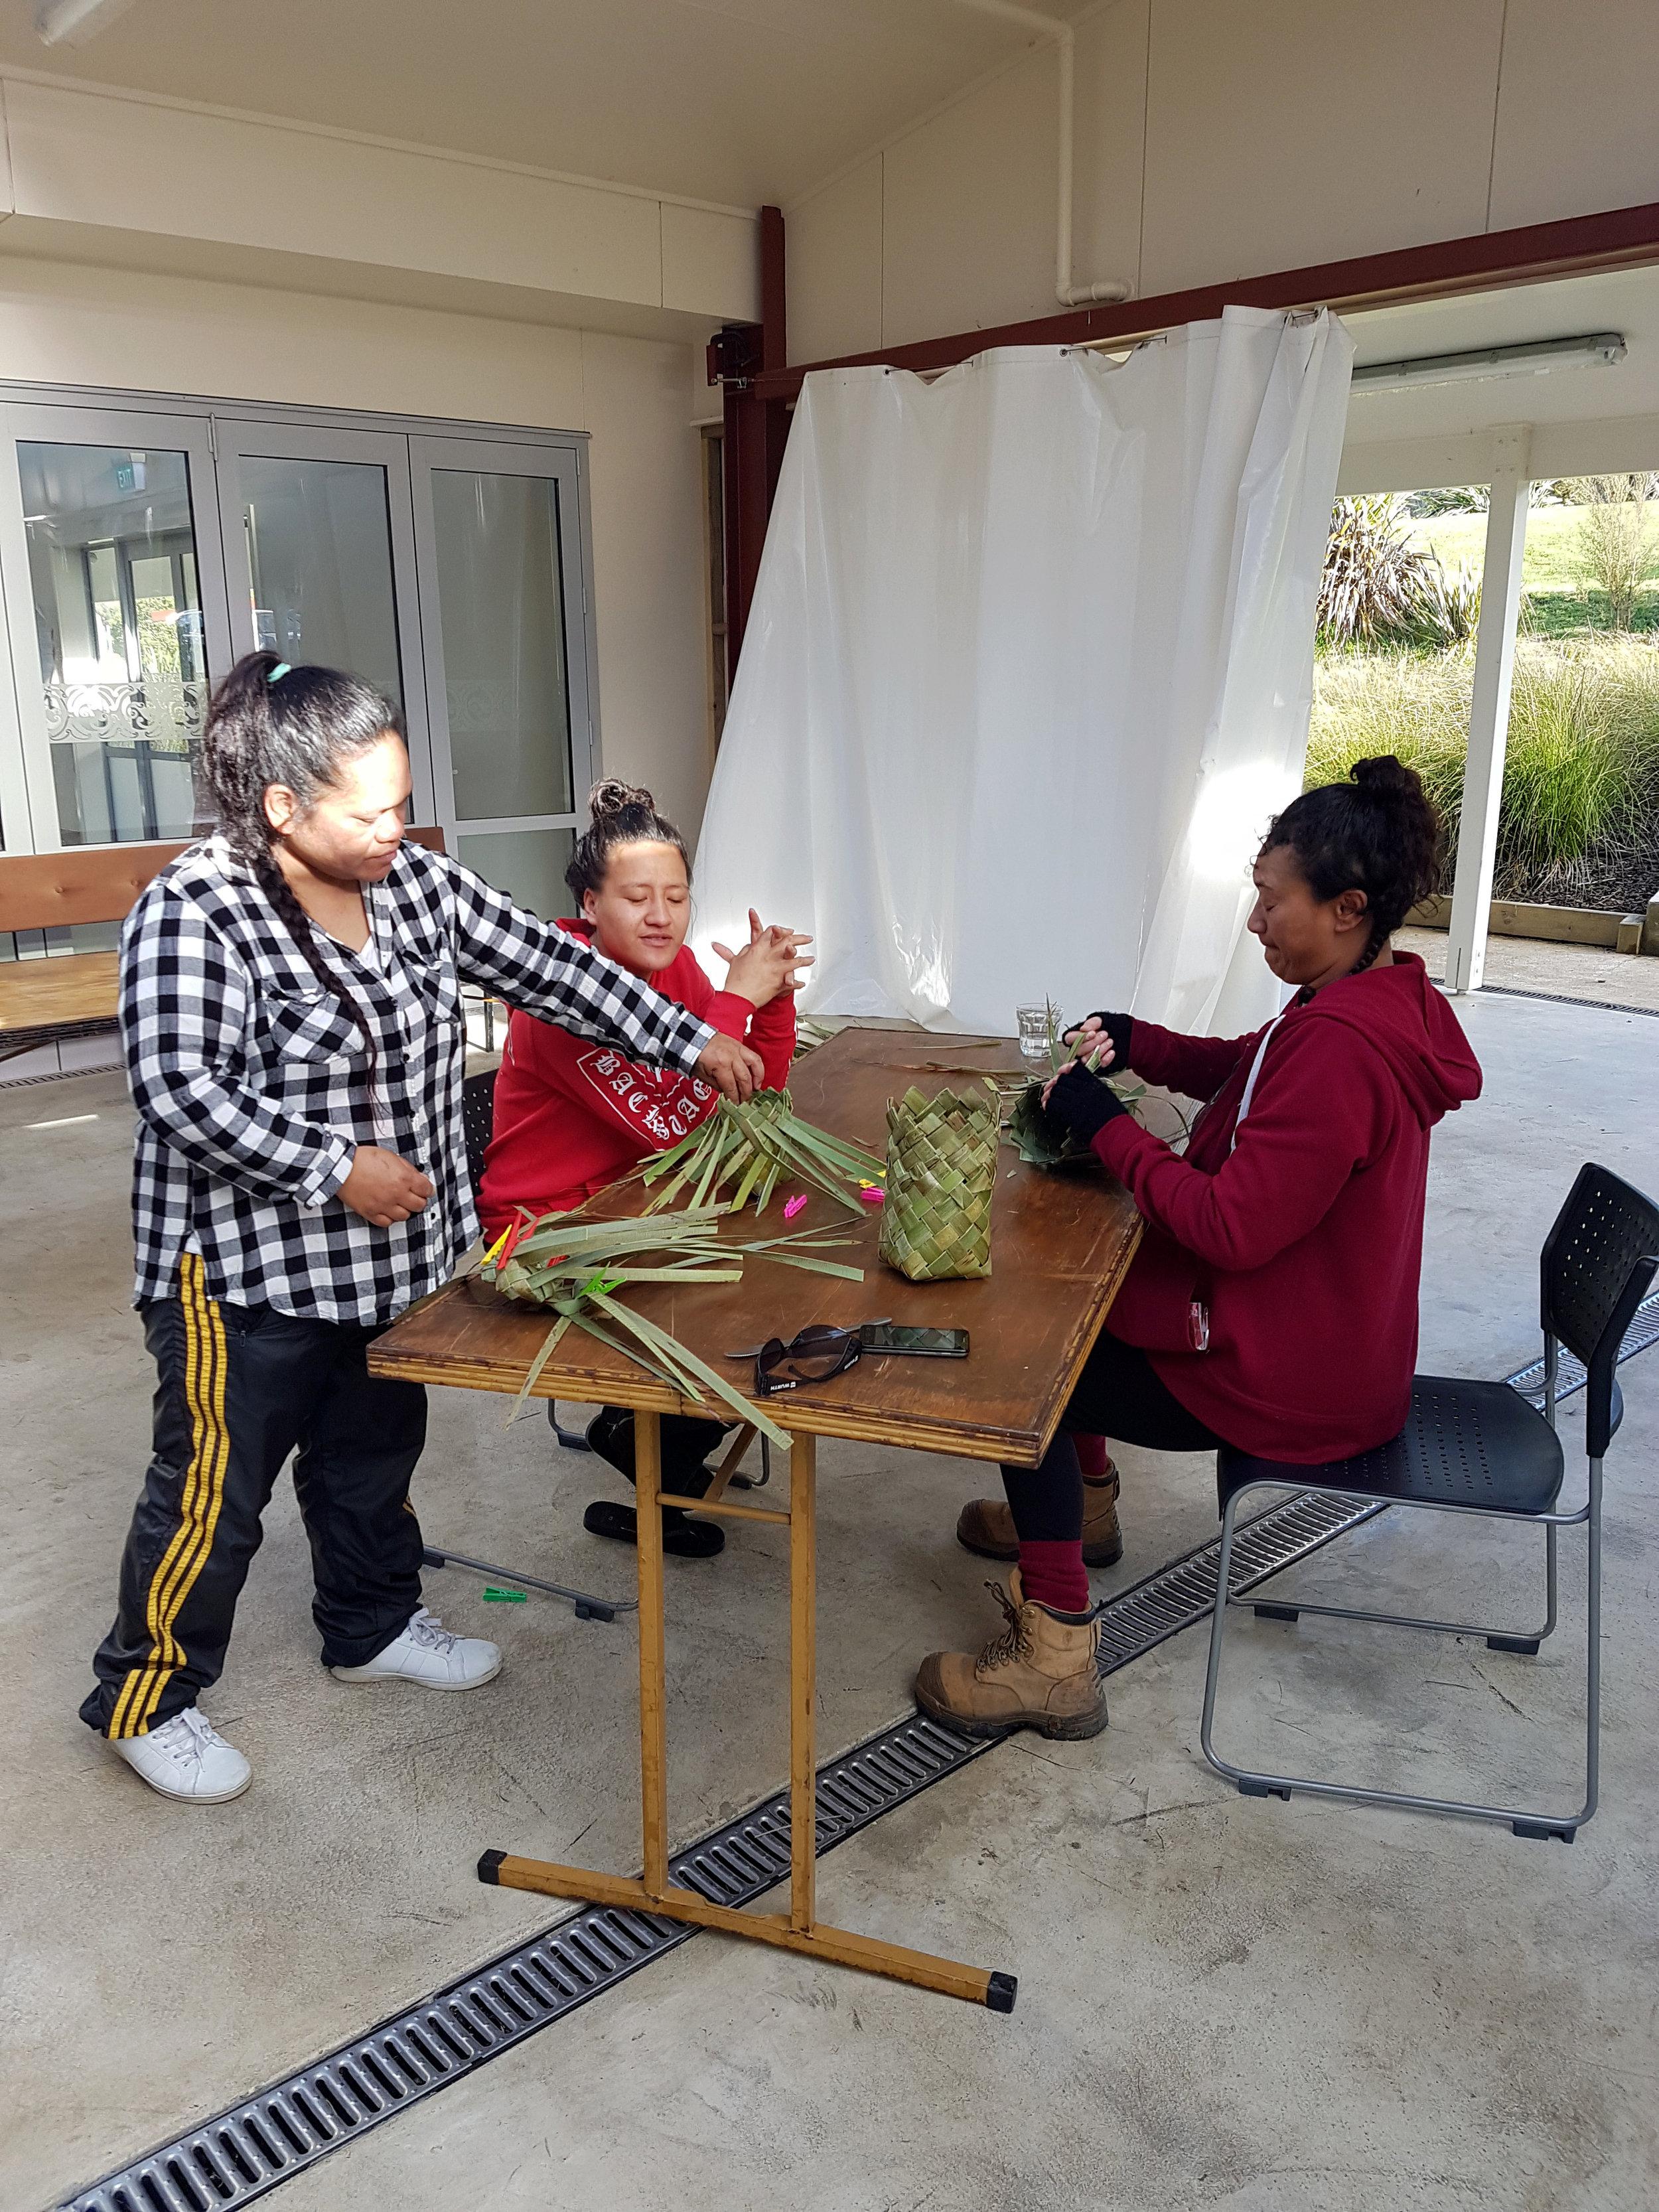 Kono and konae weaving